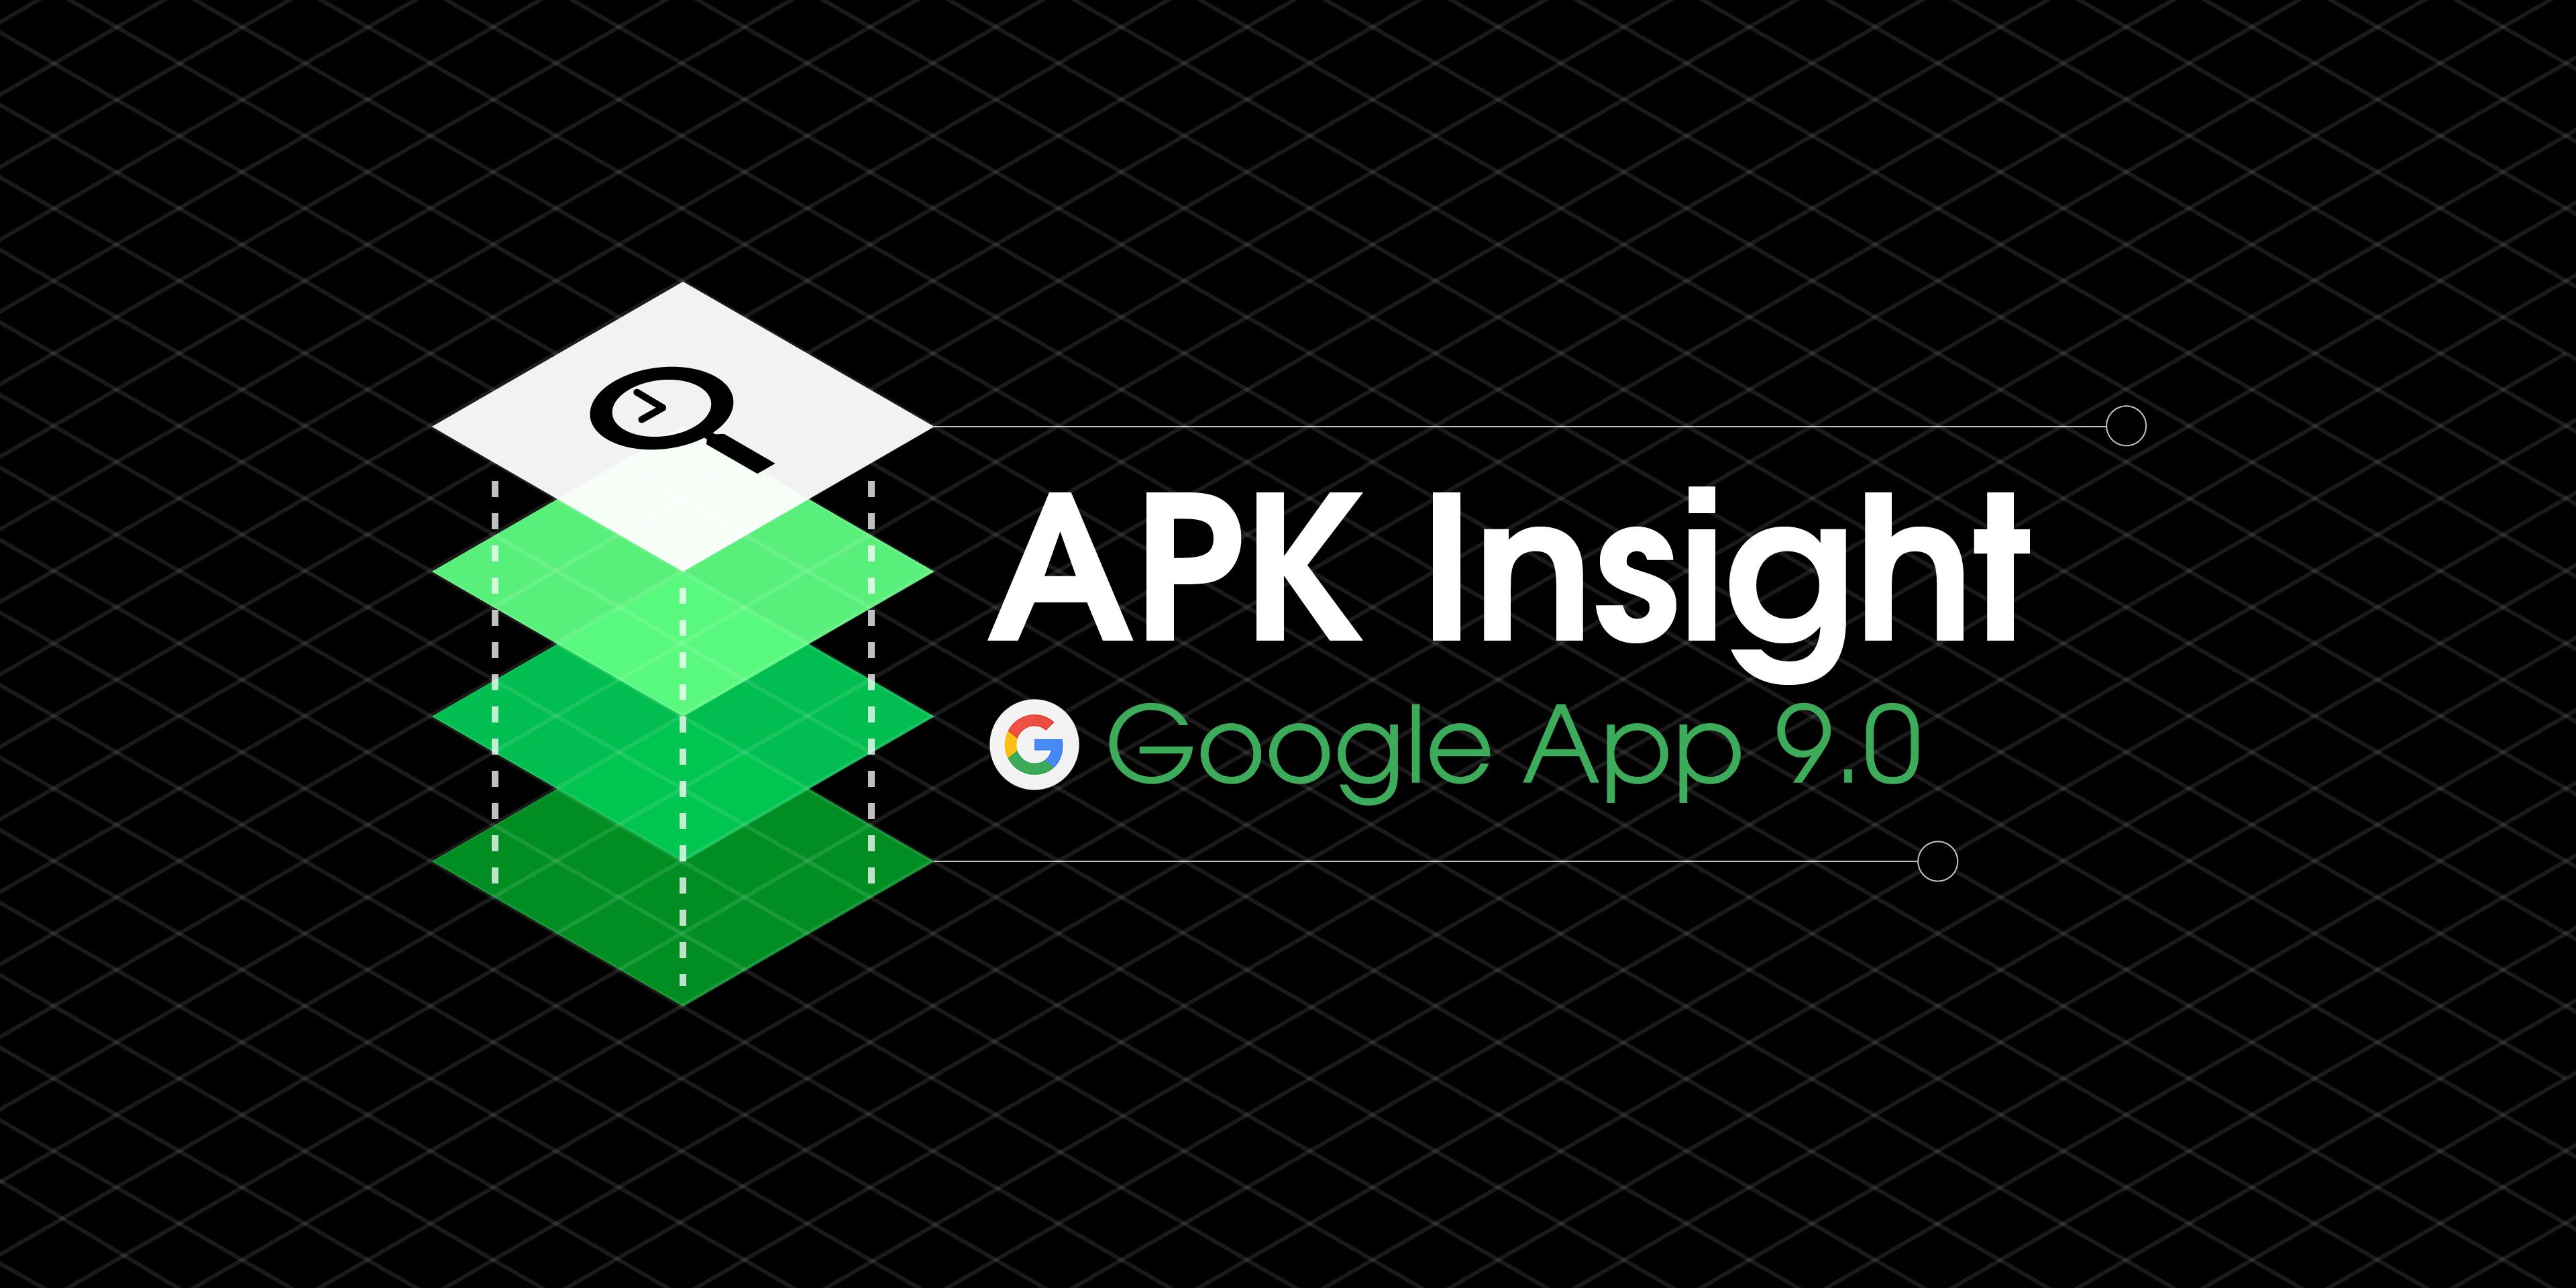 Update Aod Pixel Launcher Weather Fixed Google App 90 Preps